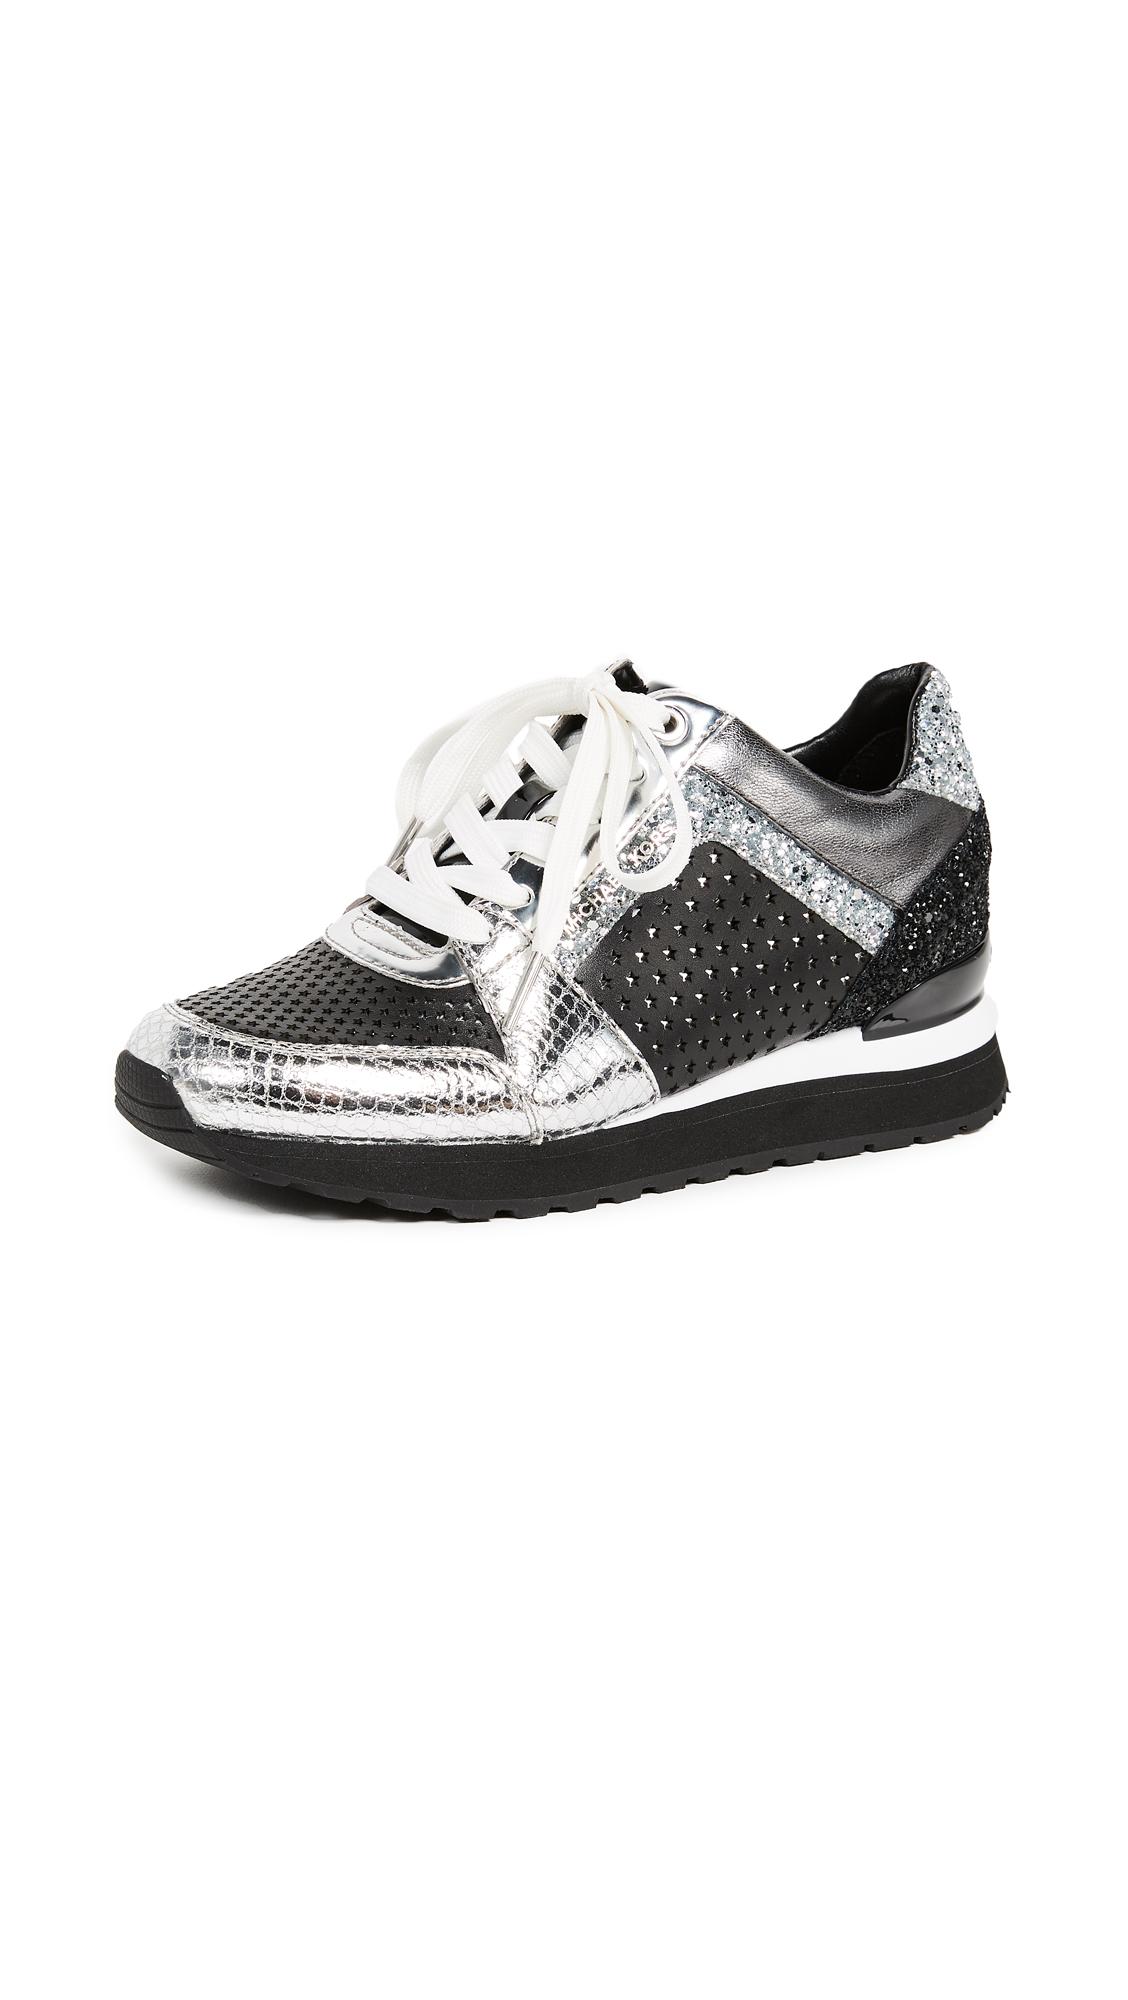 MICHAEL Michael Kors Billie Trainers - Black/Silver